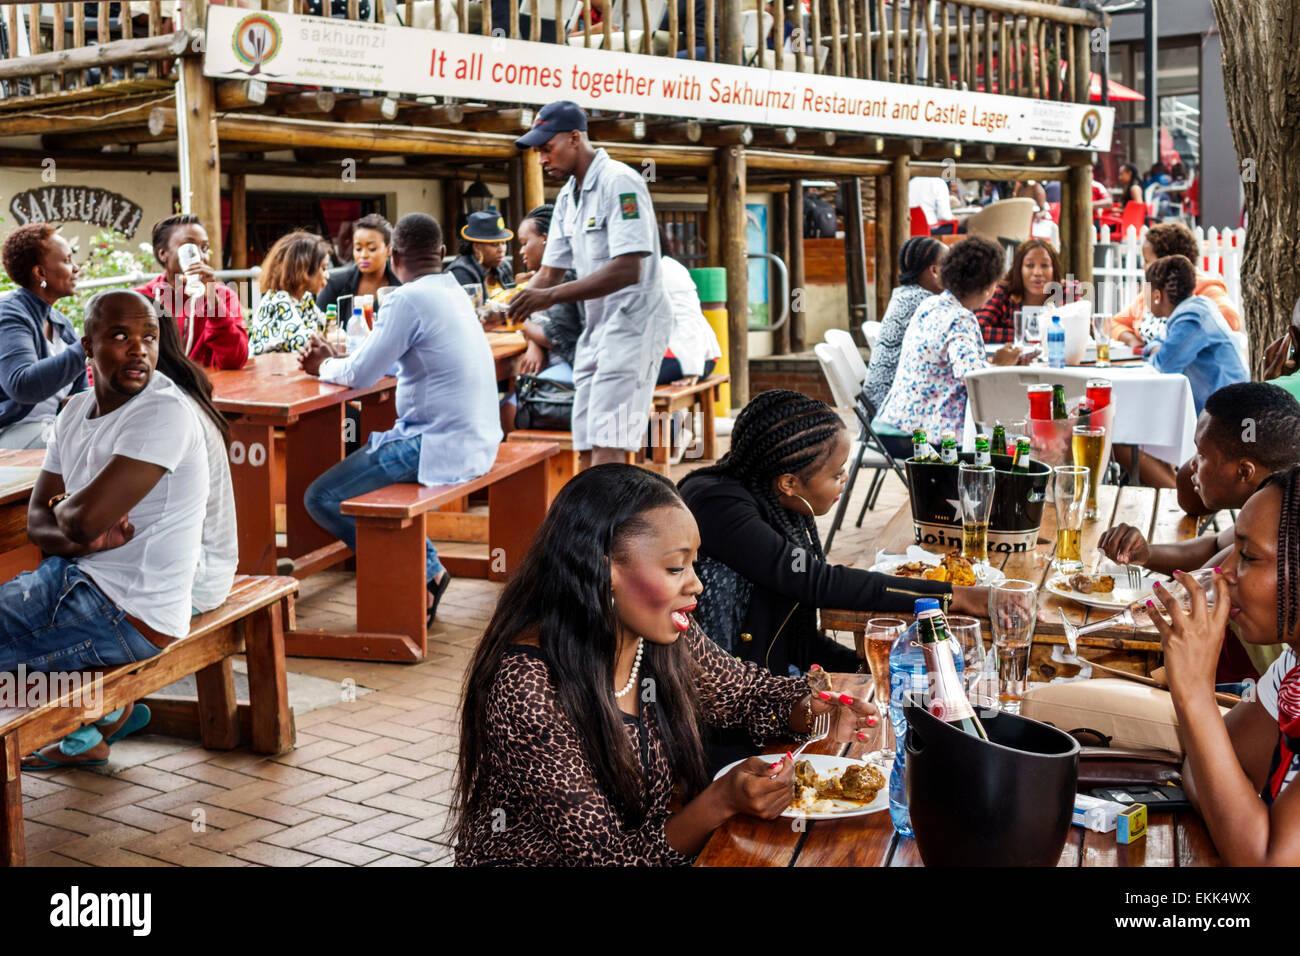 Afrique Afrique du Sud Johannesburg Soweto Vilakazi Street Precinct Sakhumzi restaurant Black femme homme friends Photo Stock